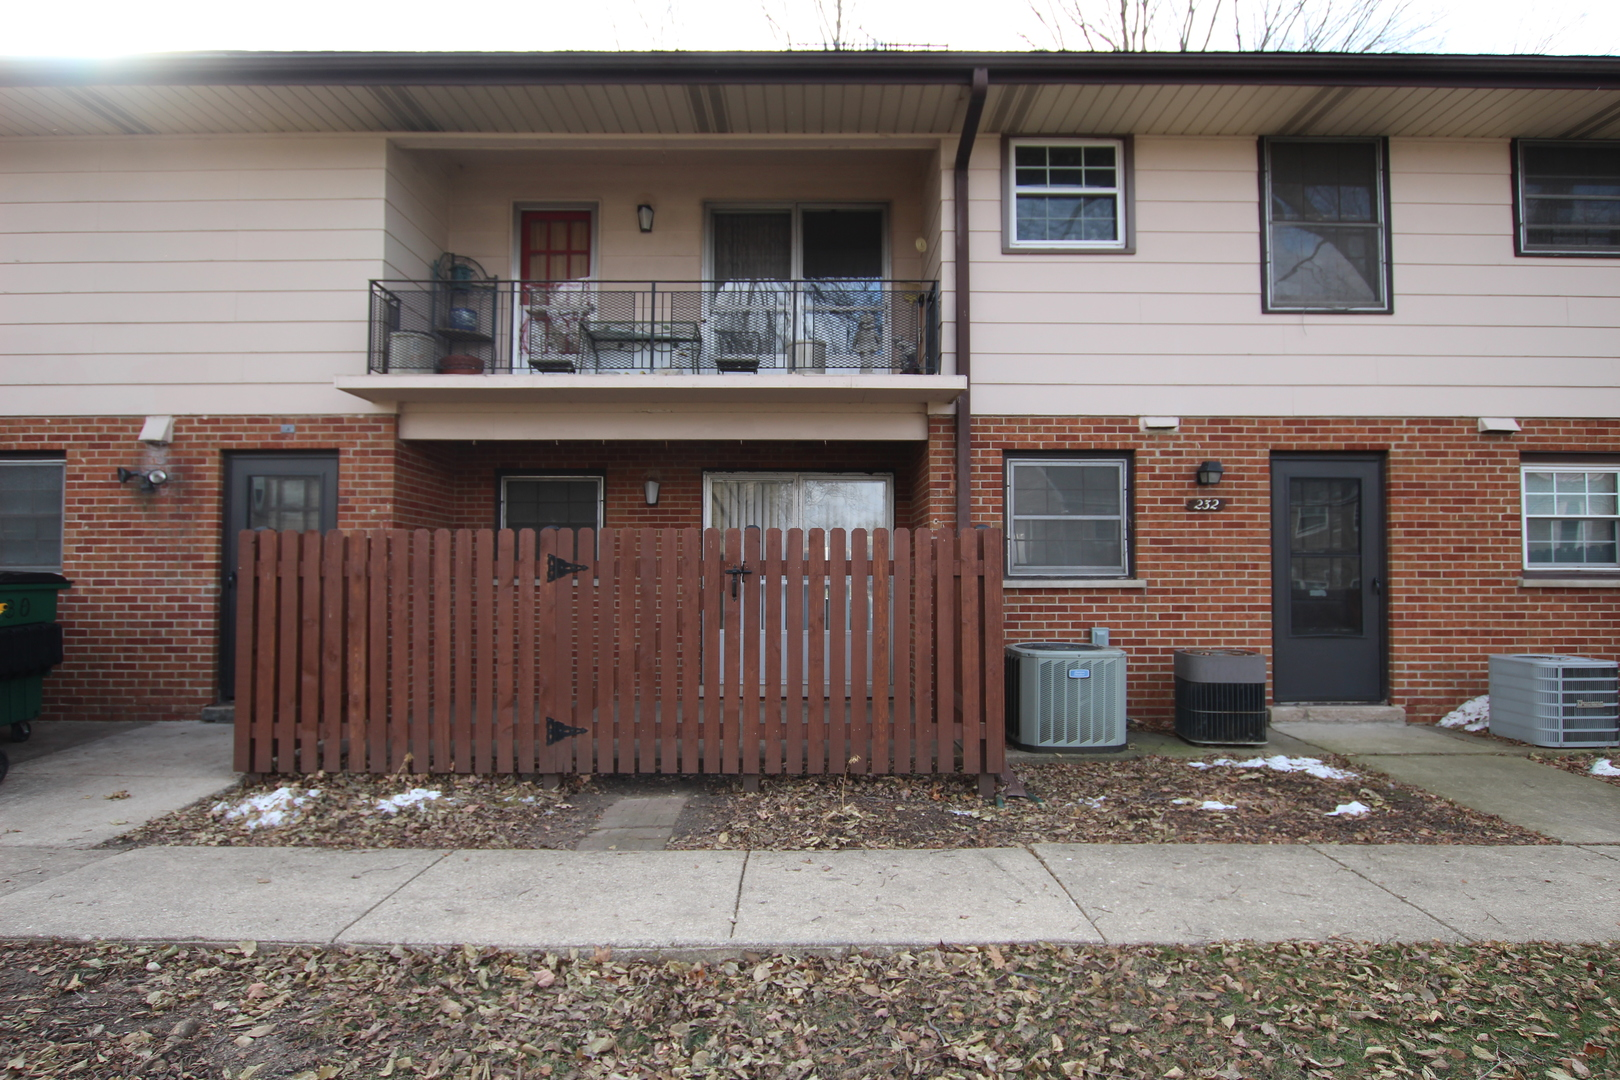 232 WASHINGTON B, ELK GROVE VILLAGE, Illinois, 60007